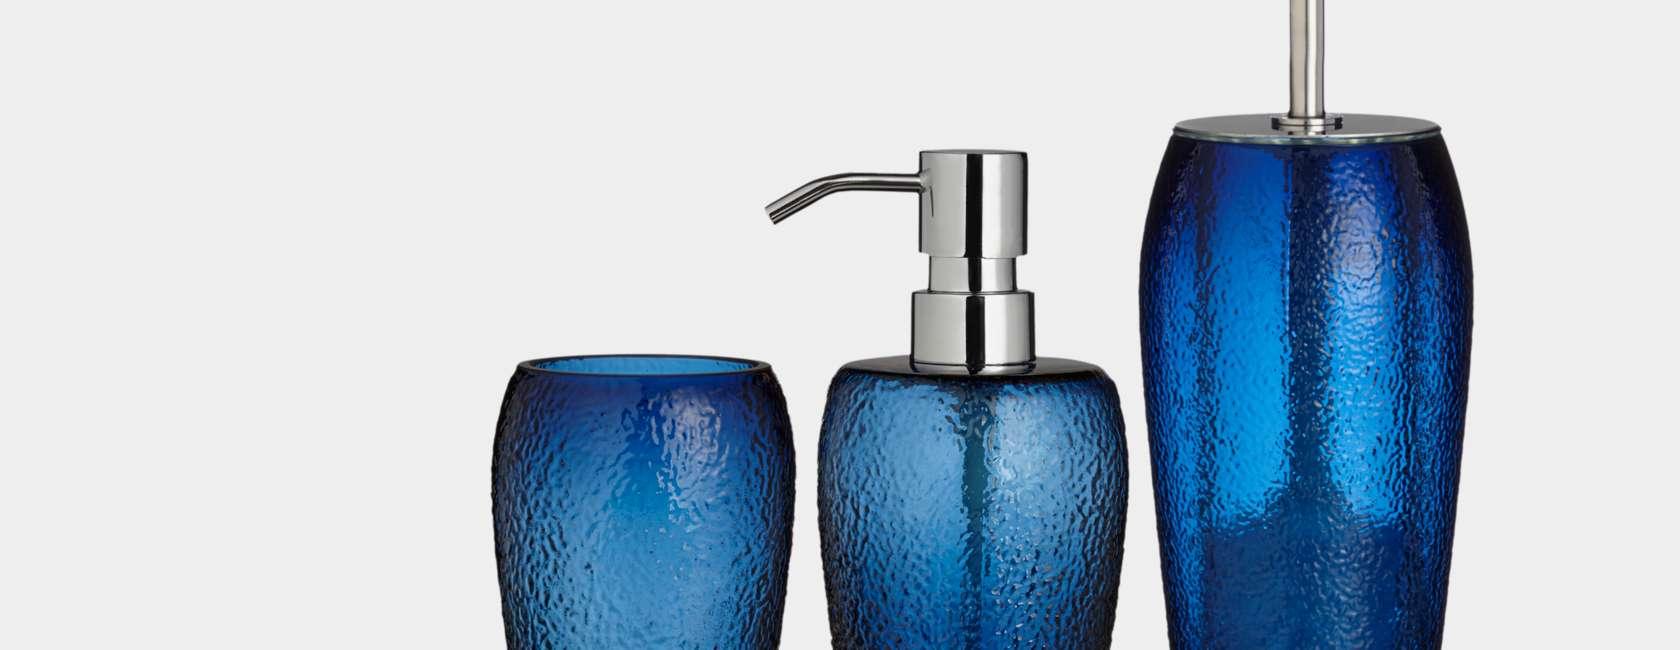 John Lewis & Partners Glass Dark Nordic Blue, Bathroom Accessories